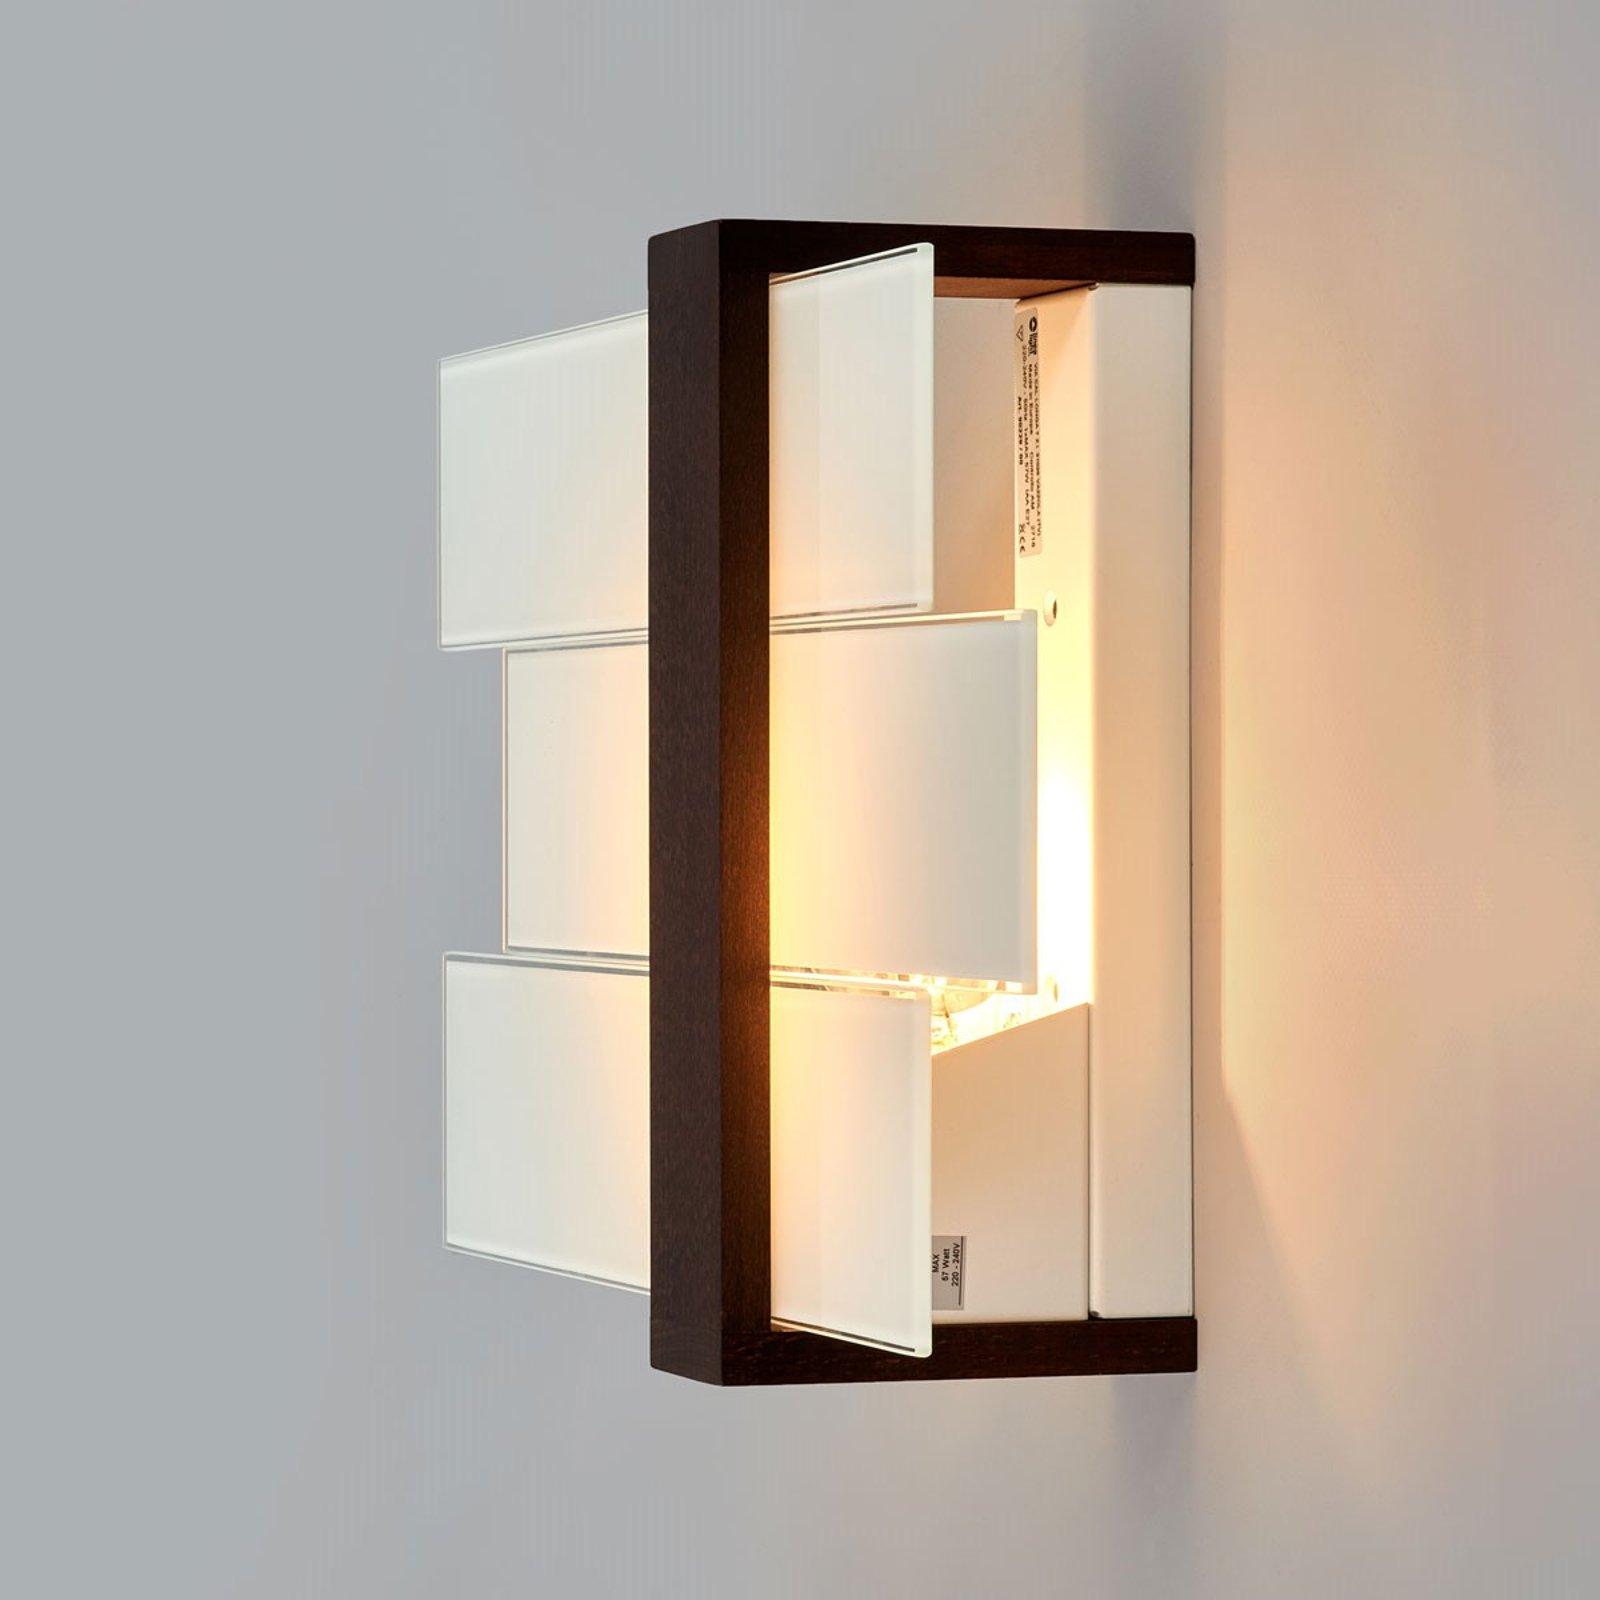 Attraktiv TRIAD vegg- og taklampe